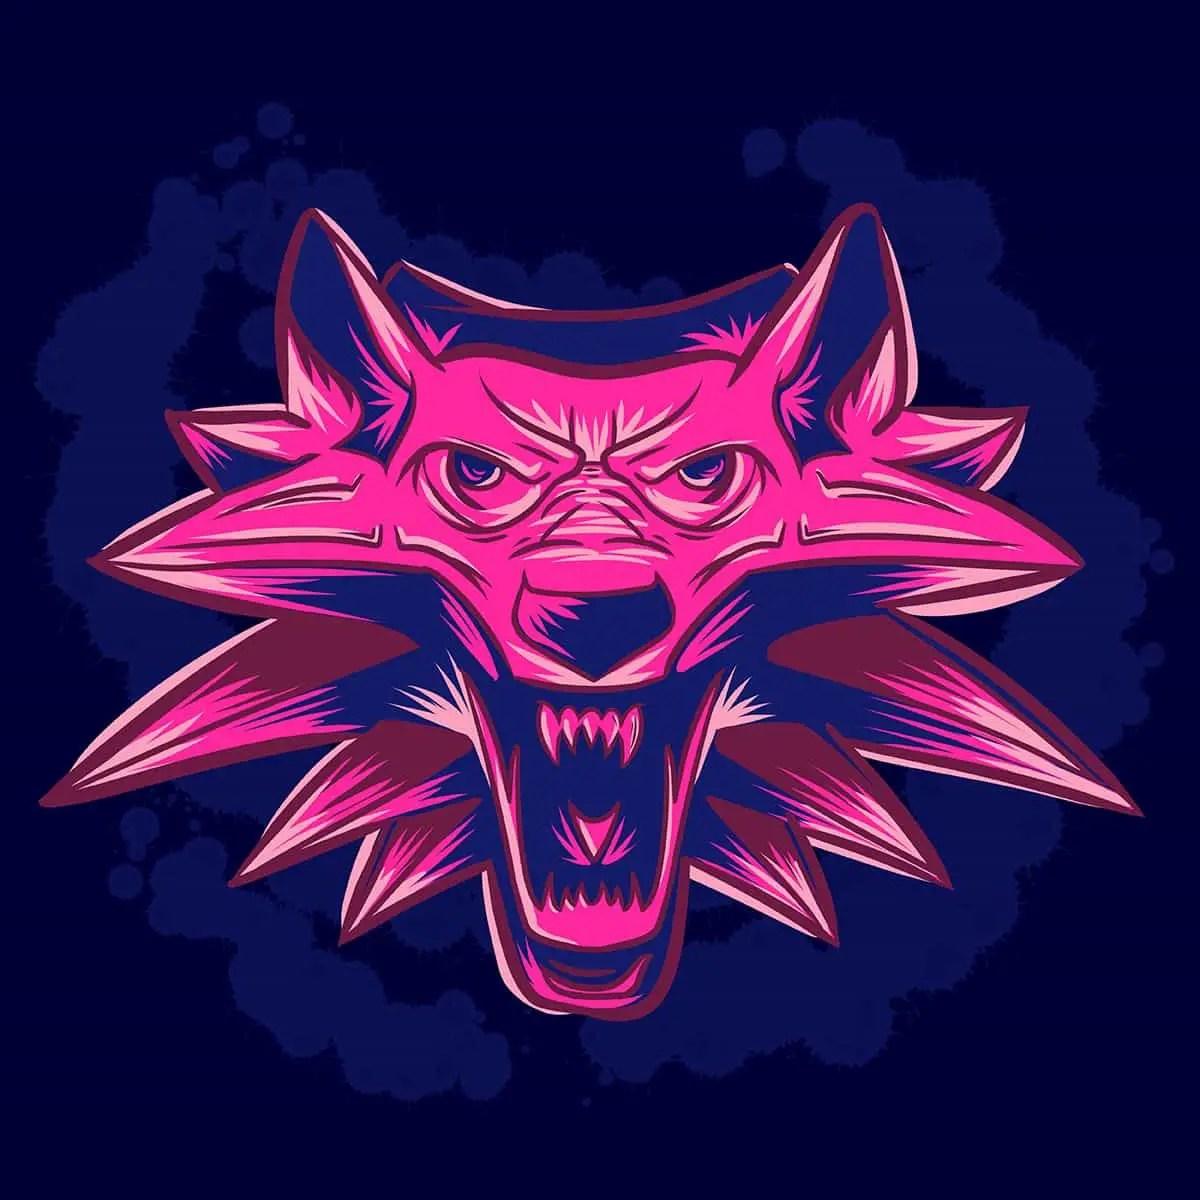 witcher 3 wild hunt, illustration, fan art, retro gaming, game